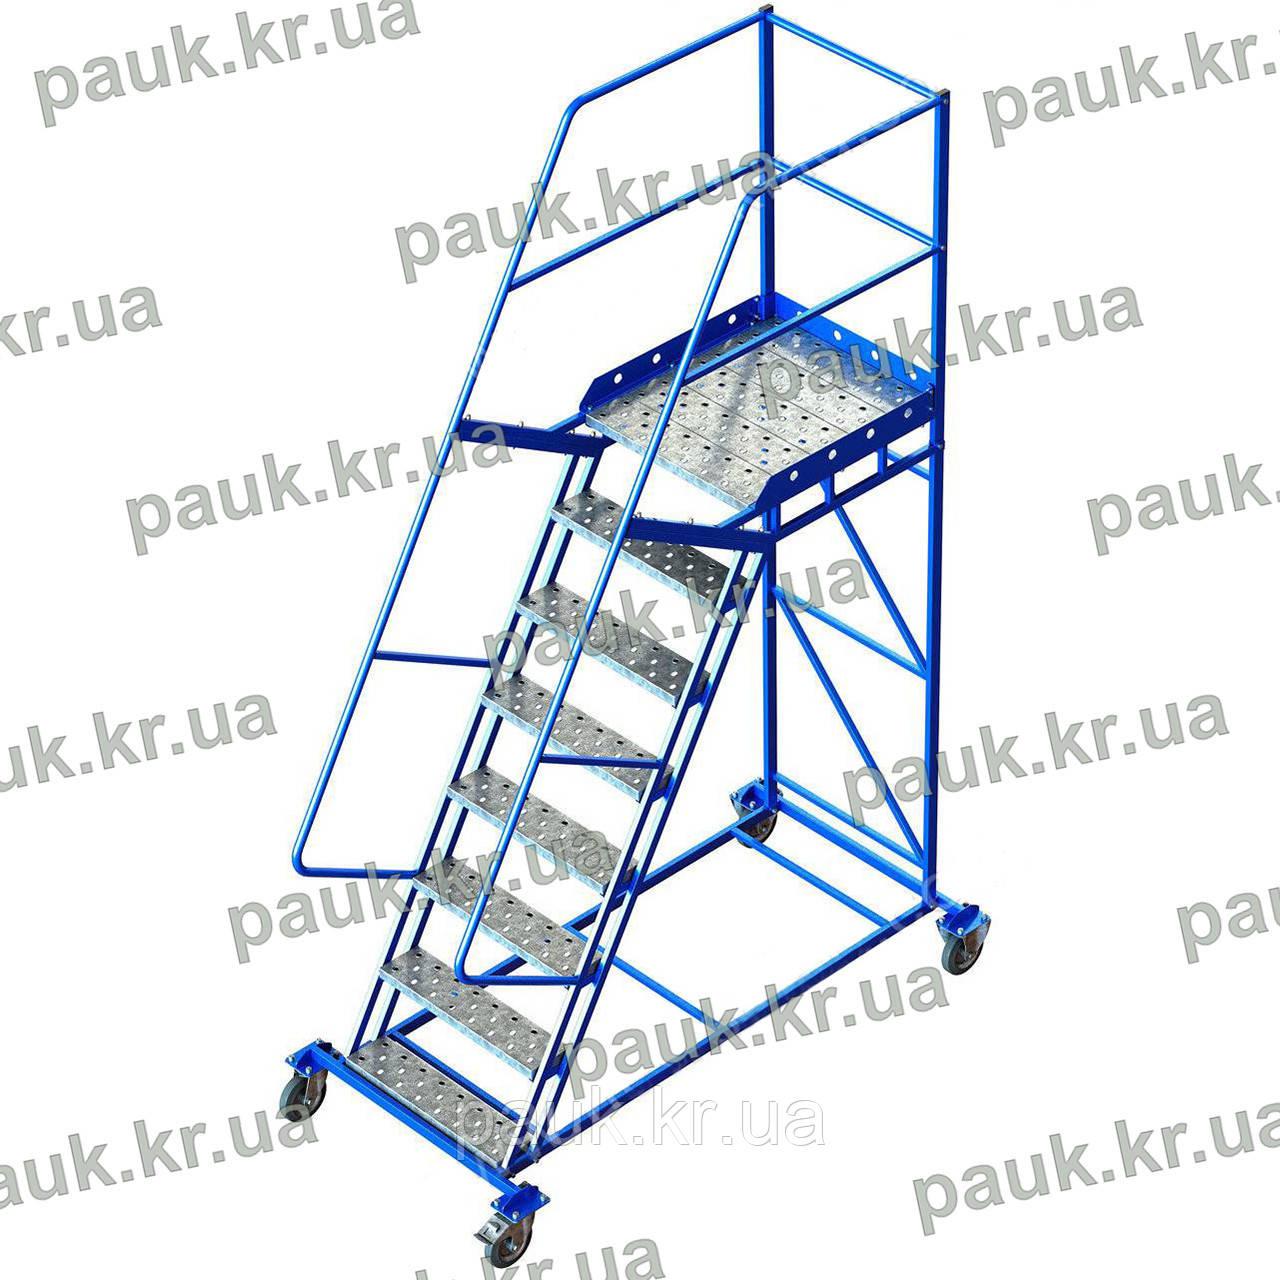 Складська драбина Н2000 мм, драбина з платформою